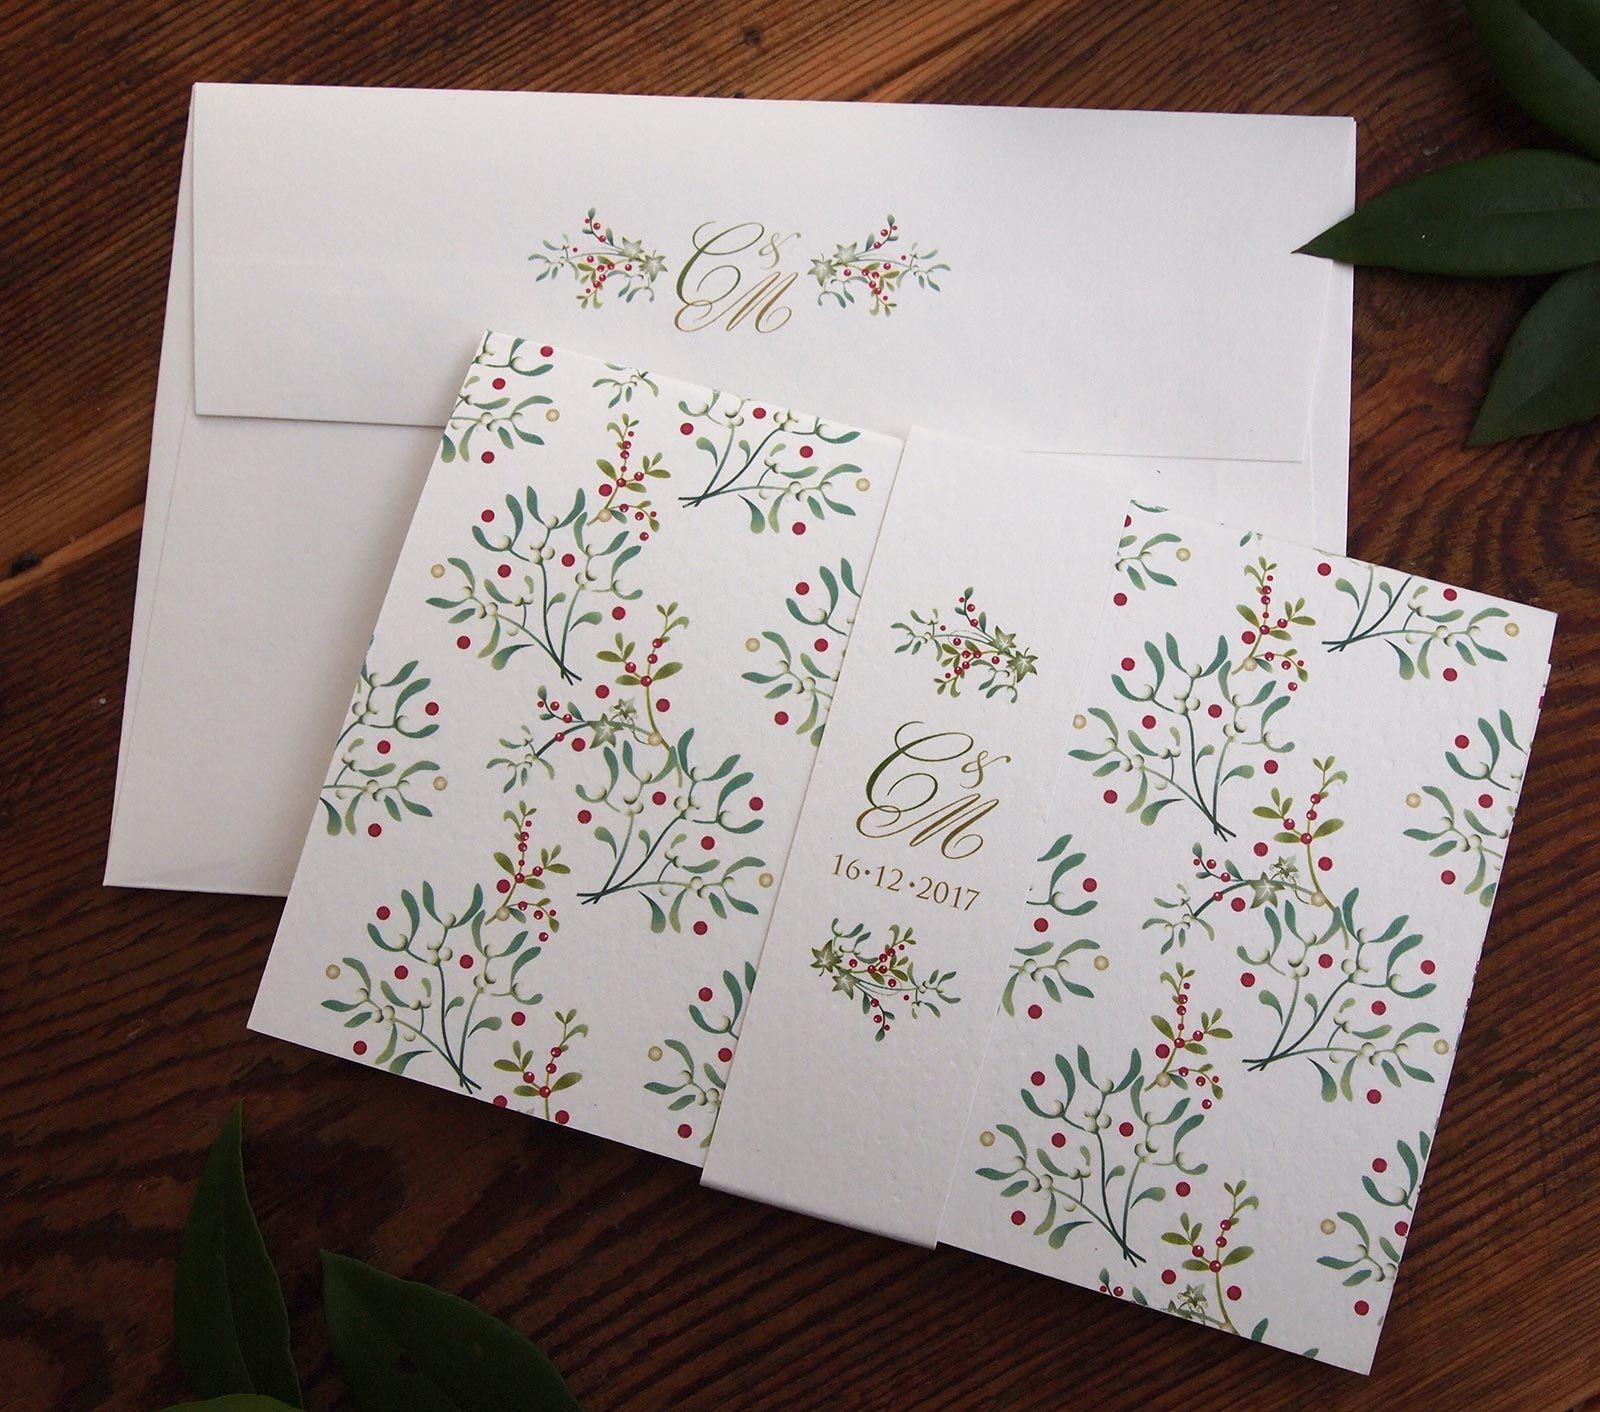 Mistletoe Scroll - Festive themed wedding invitation and belly band ...